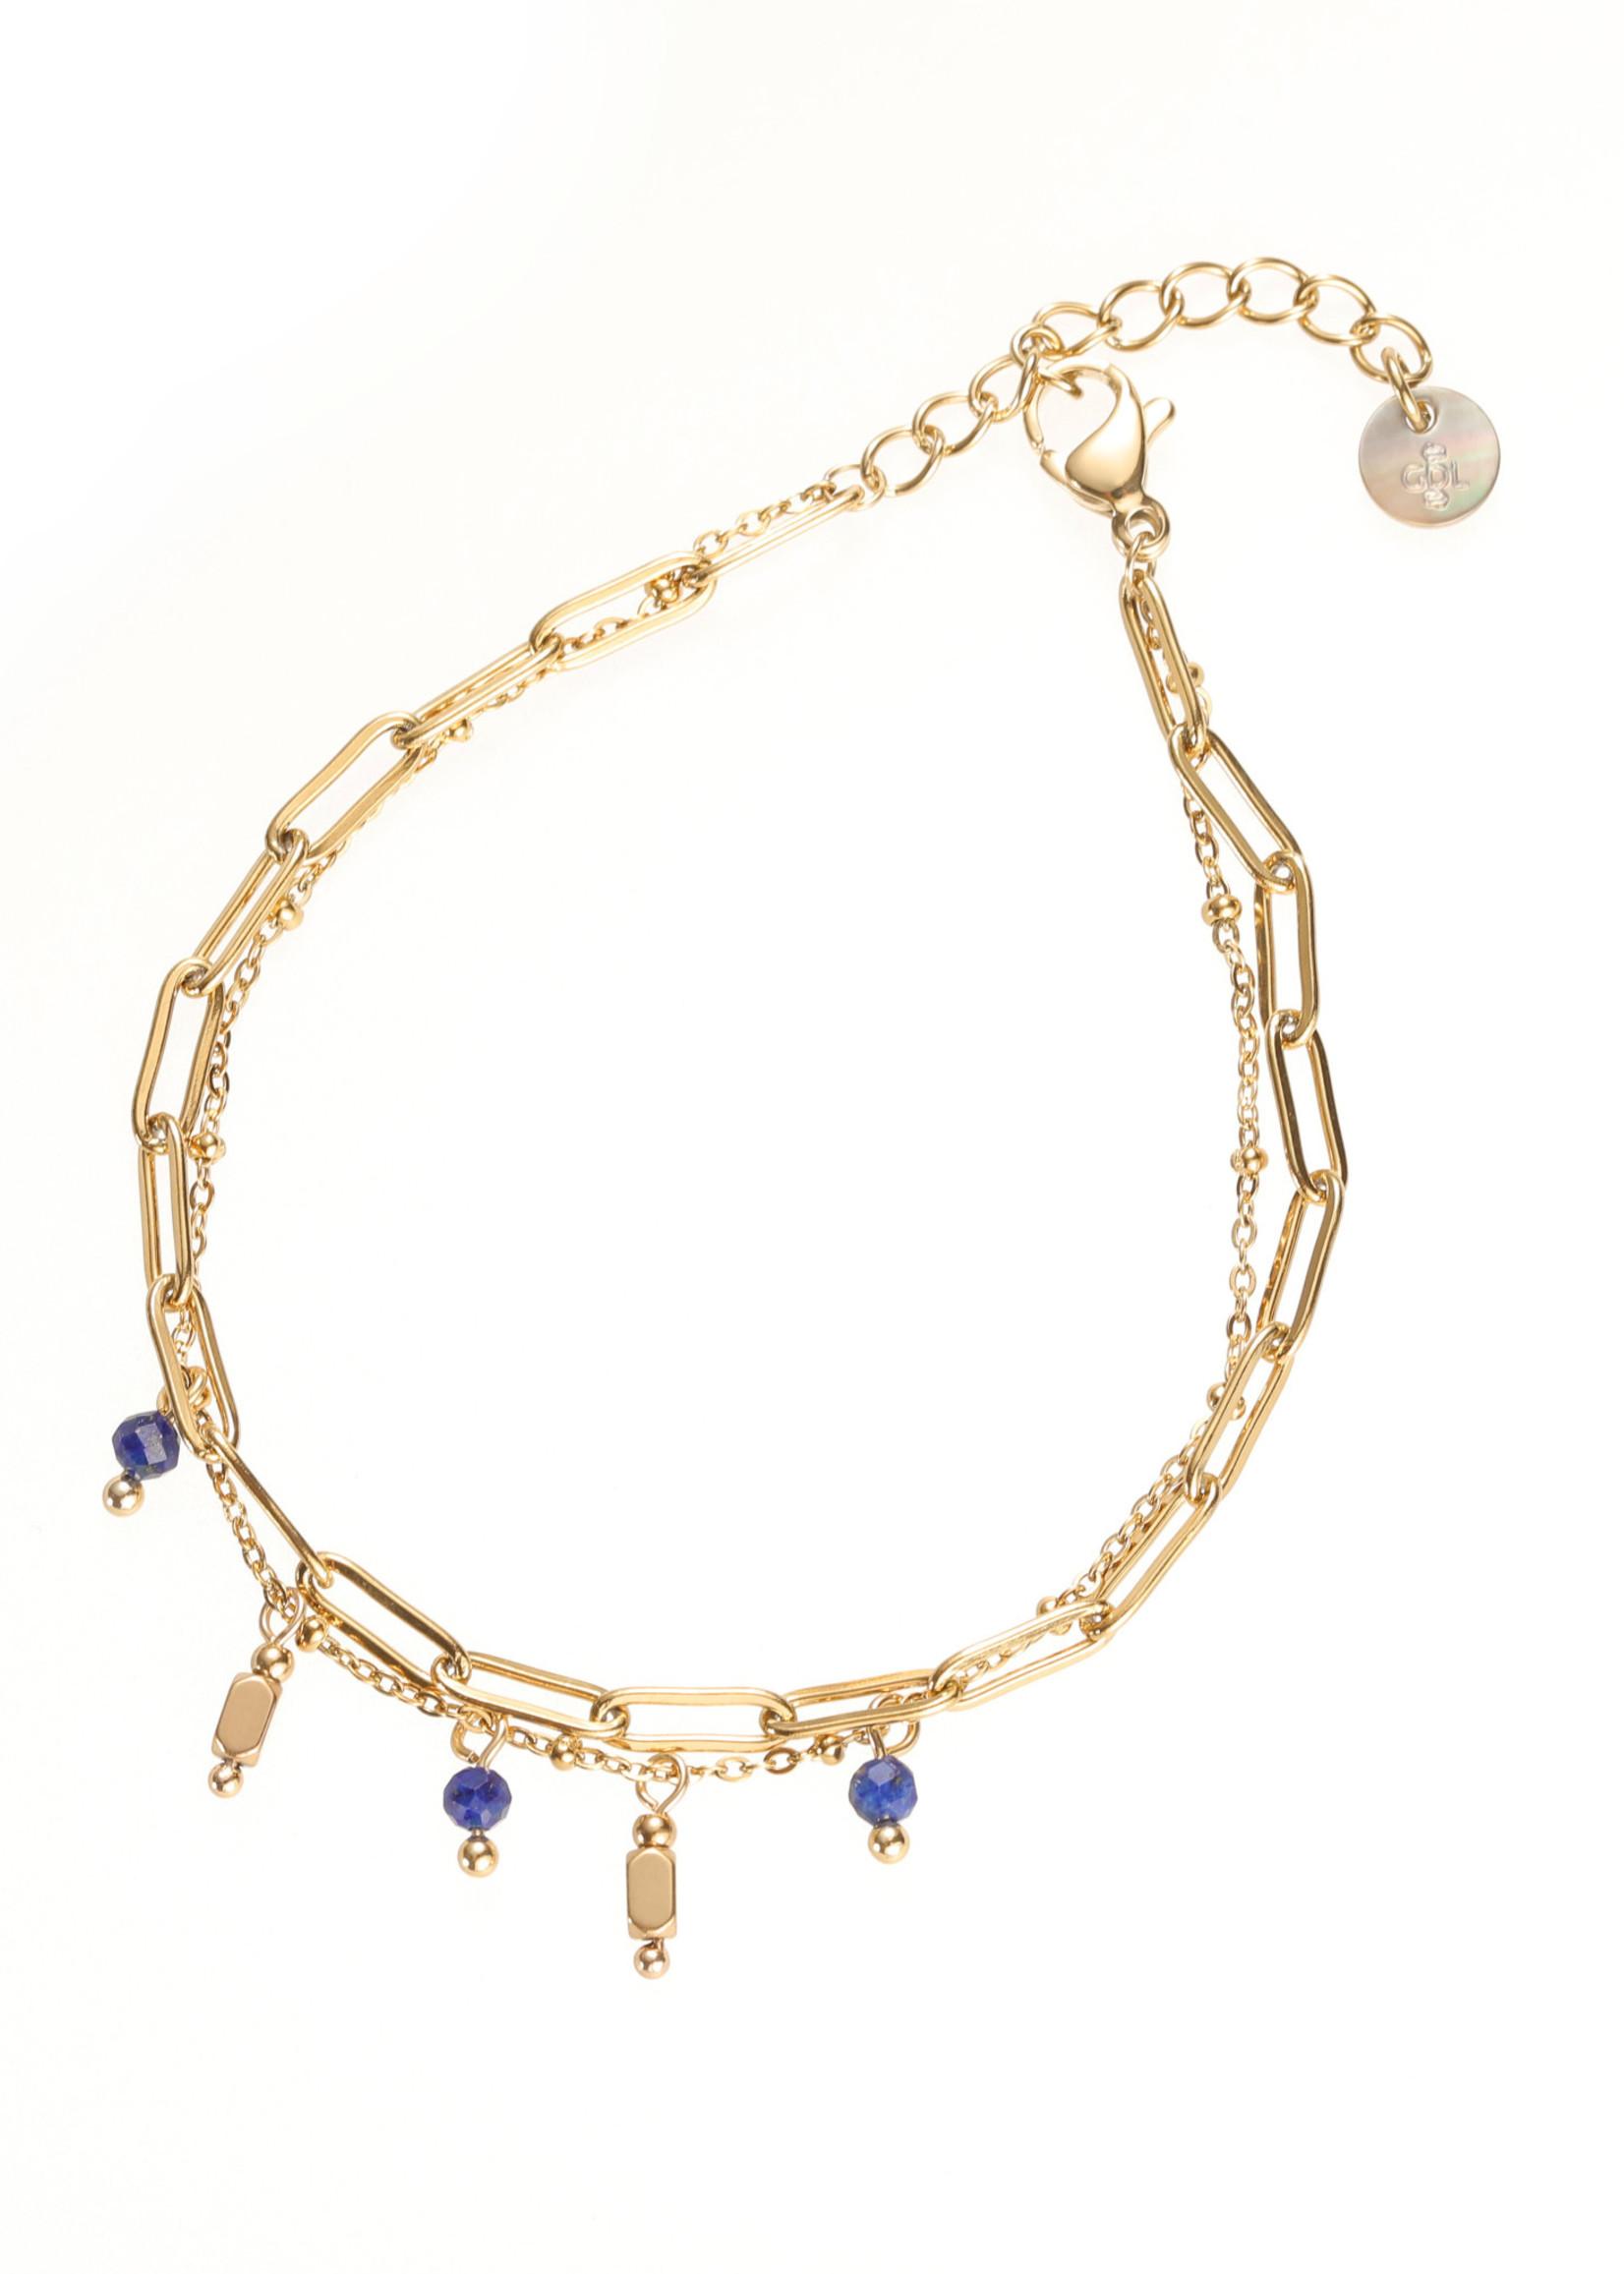 Armband goud dubbel met blauwe steentjes B1764-3